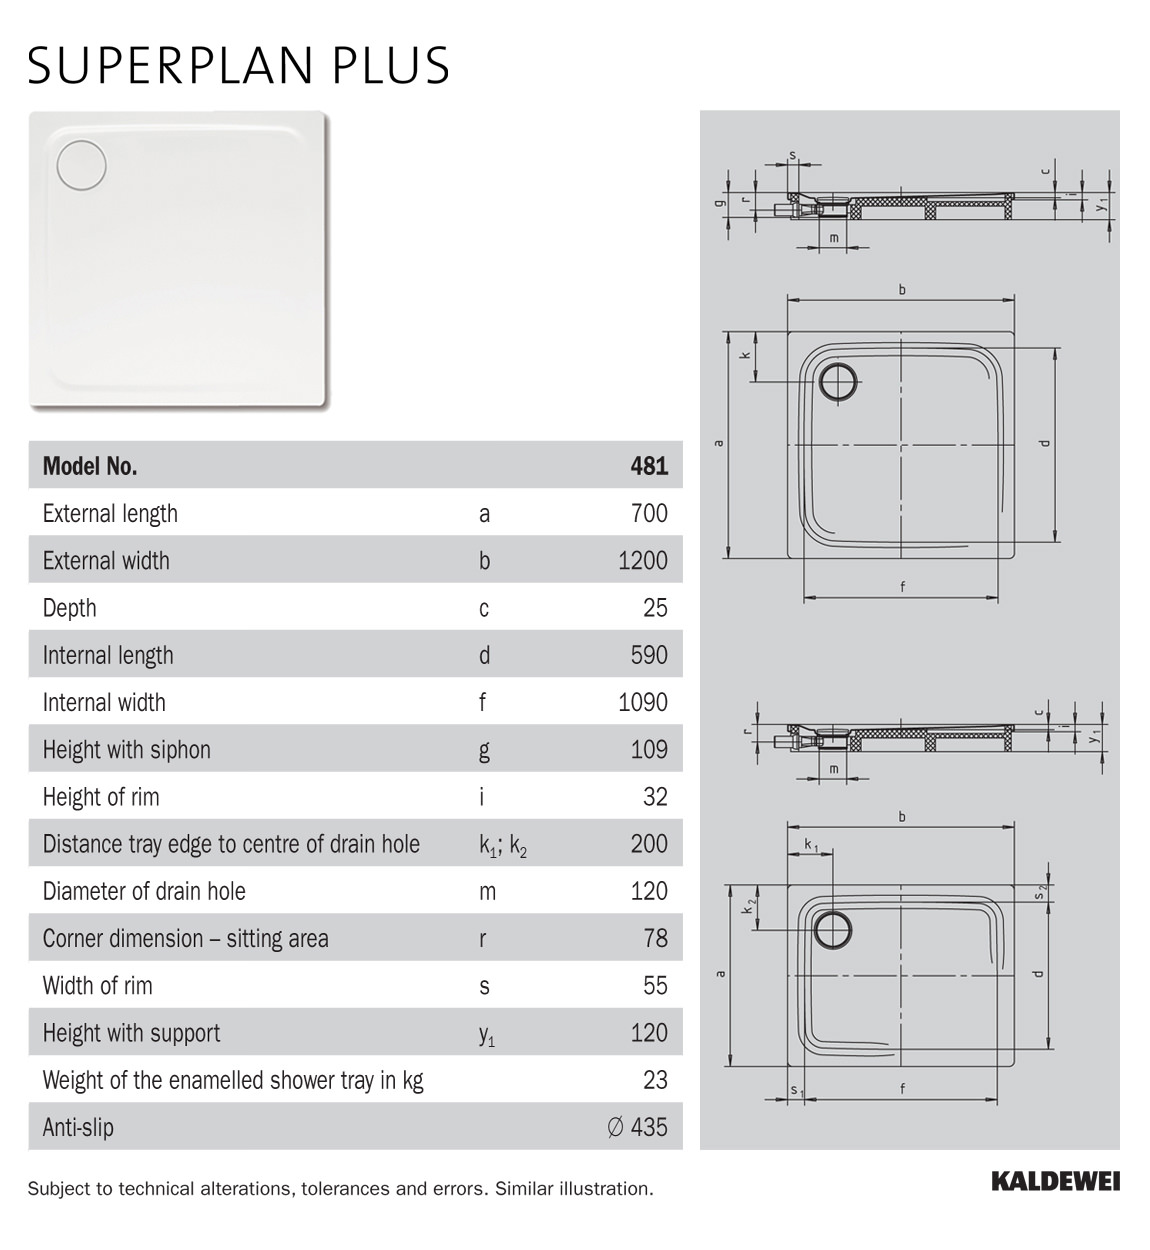 kaldewei avantgarde superplan plus 700 x 1200mm steel. Black Bedroom Furniture Sets. Home Design Ideas